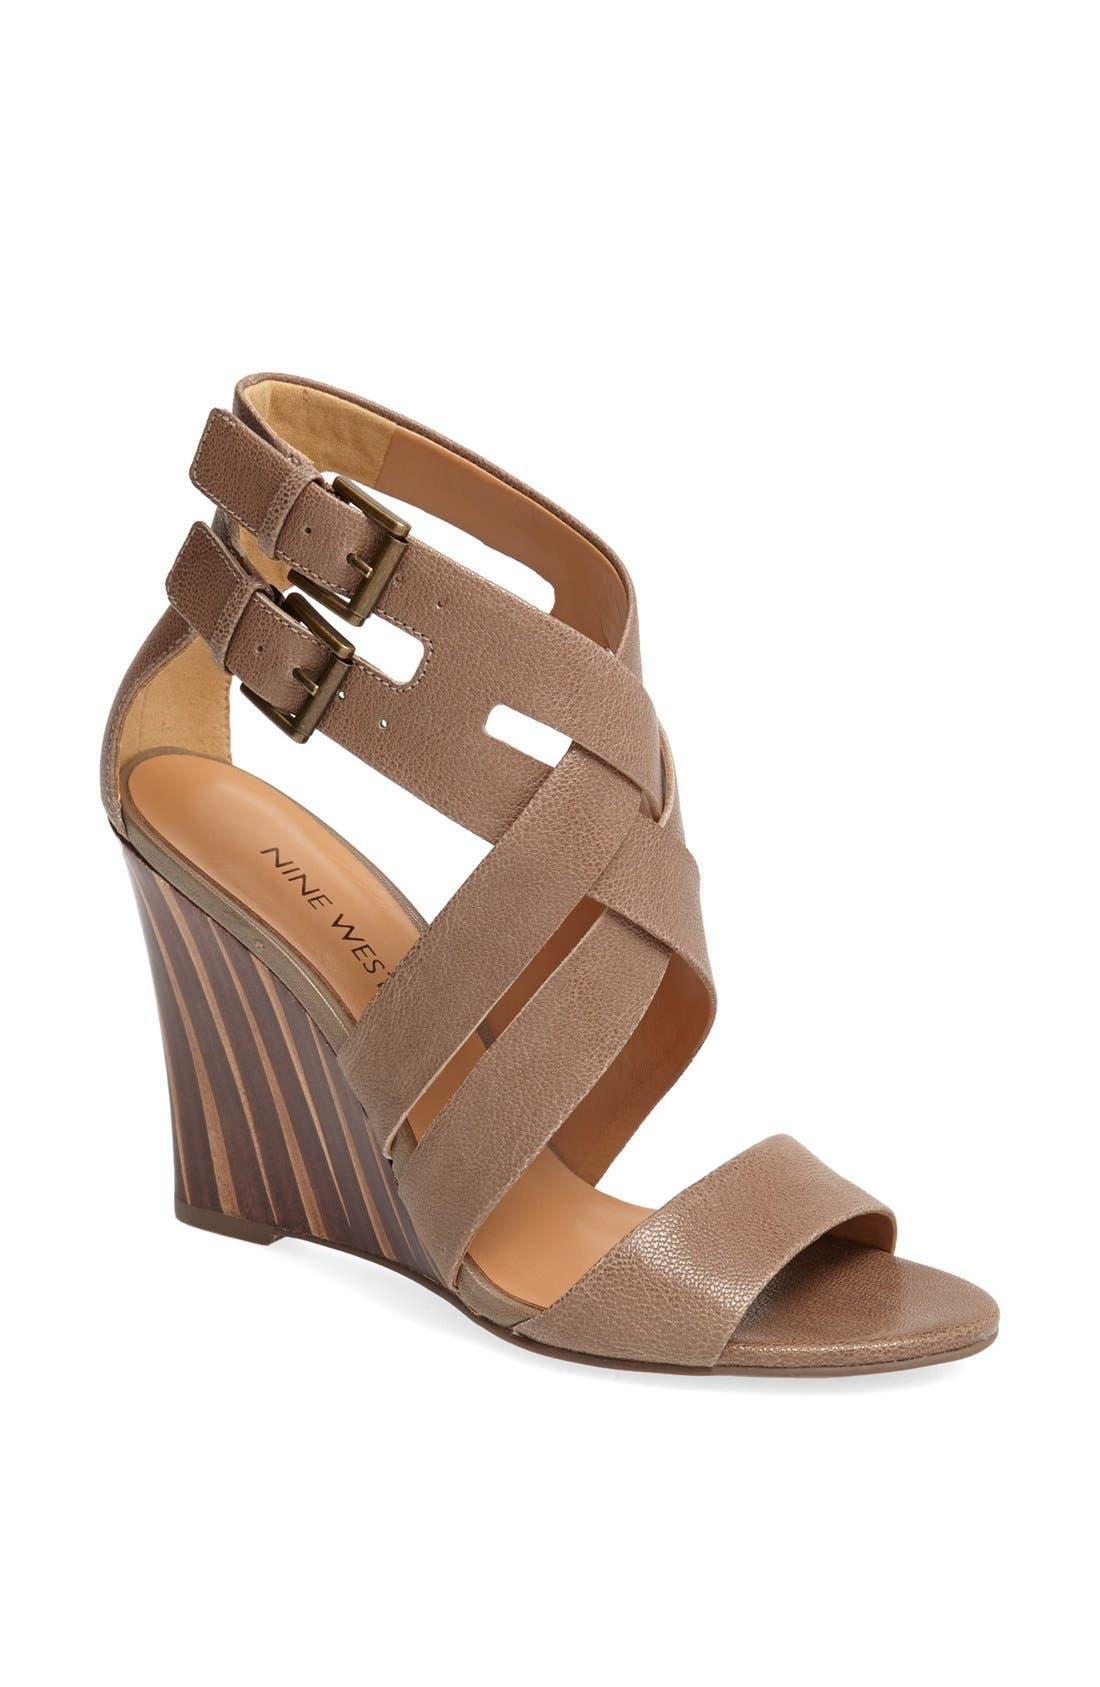 Alternate Image 1 Selected - Nine West 'Maureen' Wedge Sandal